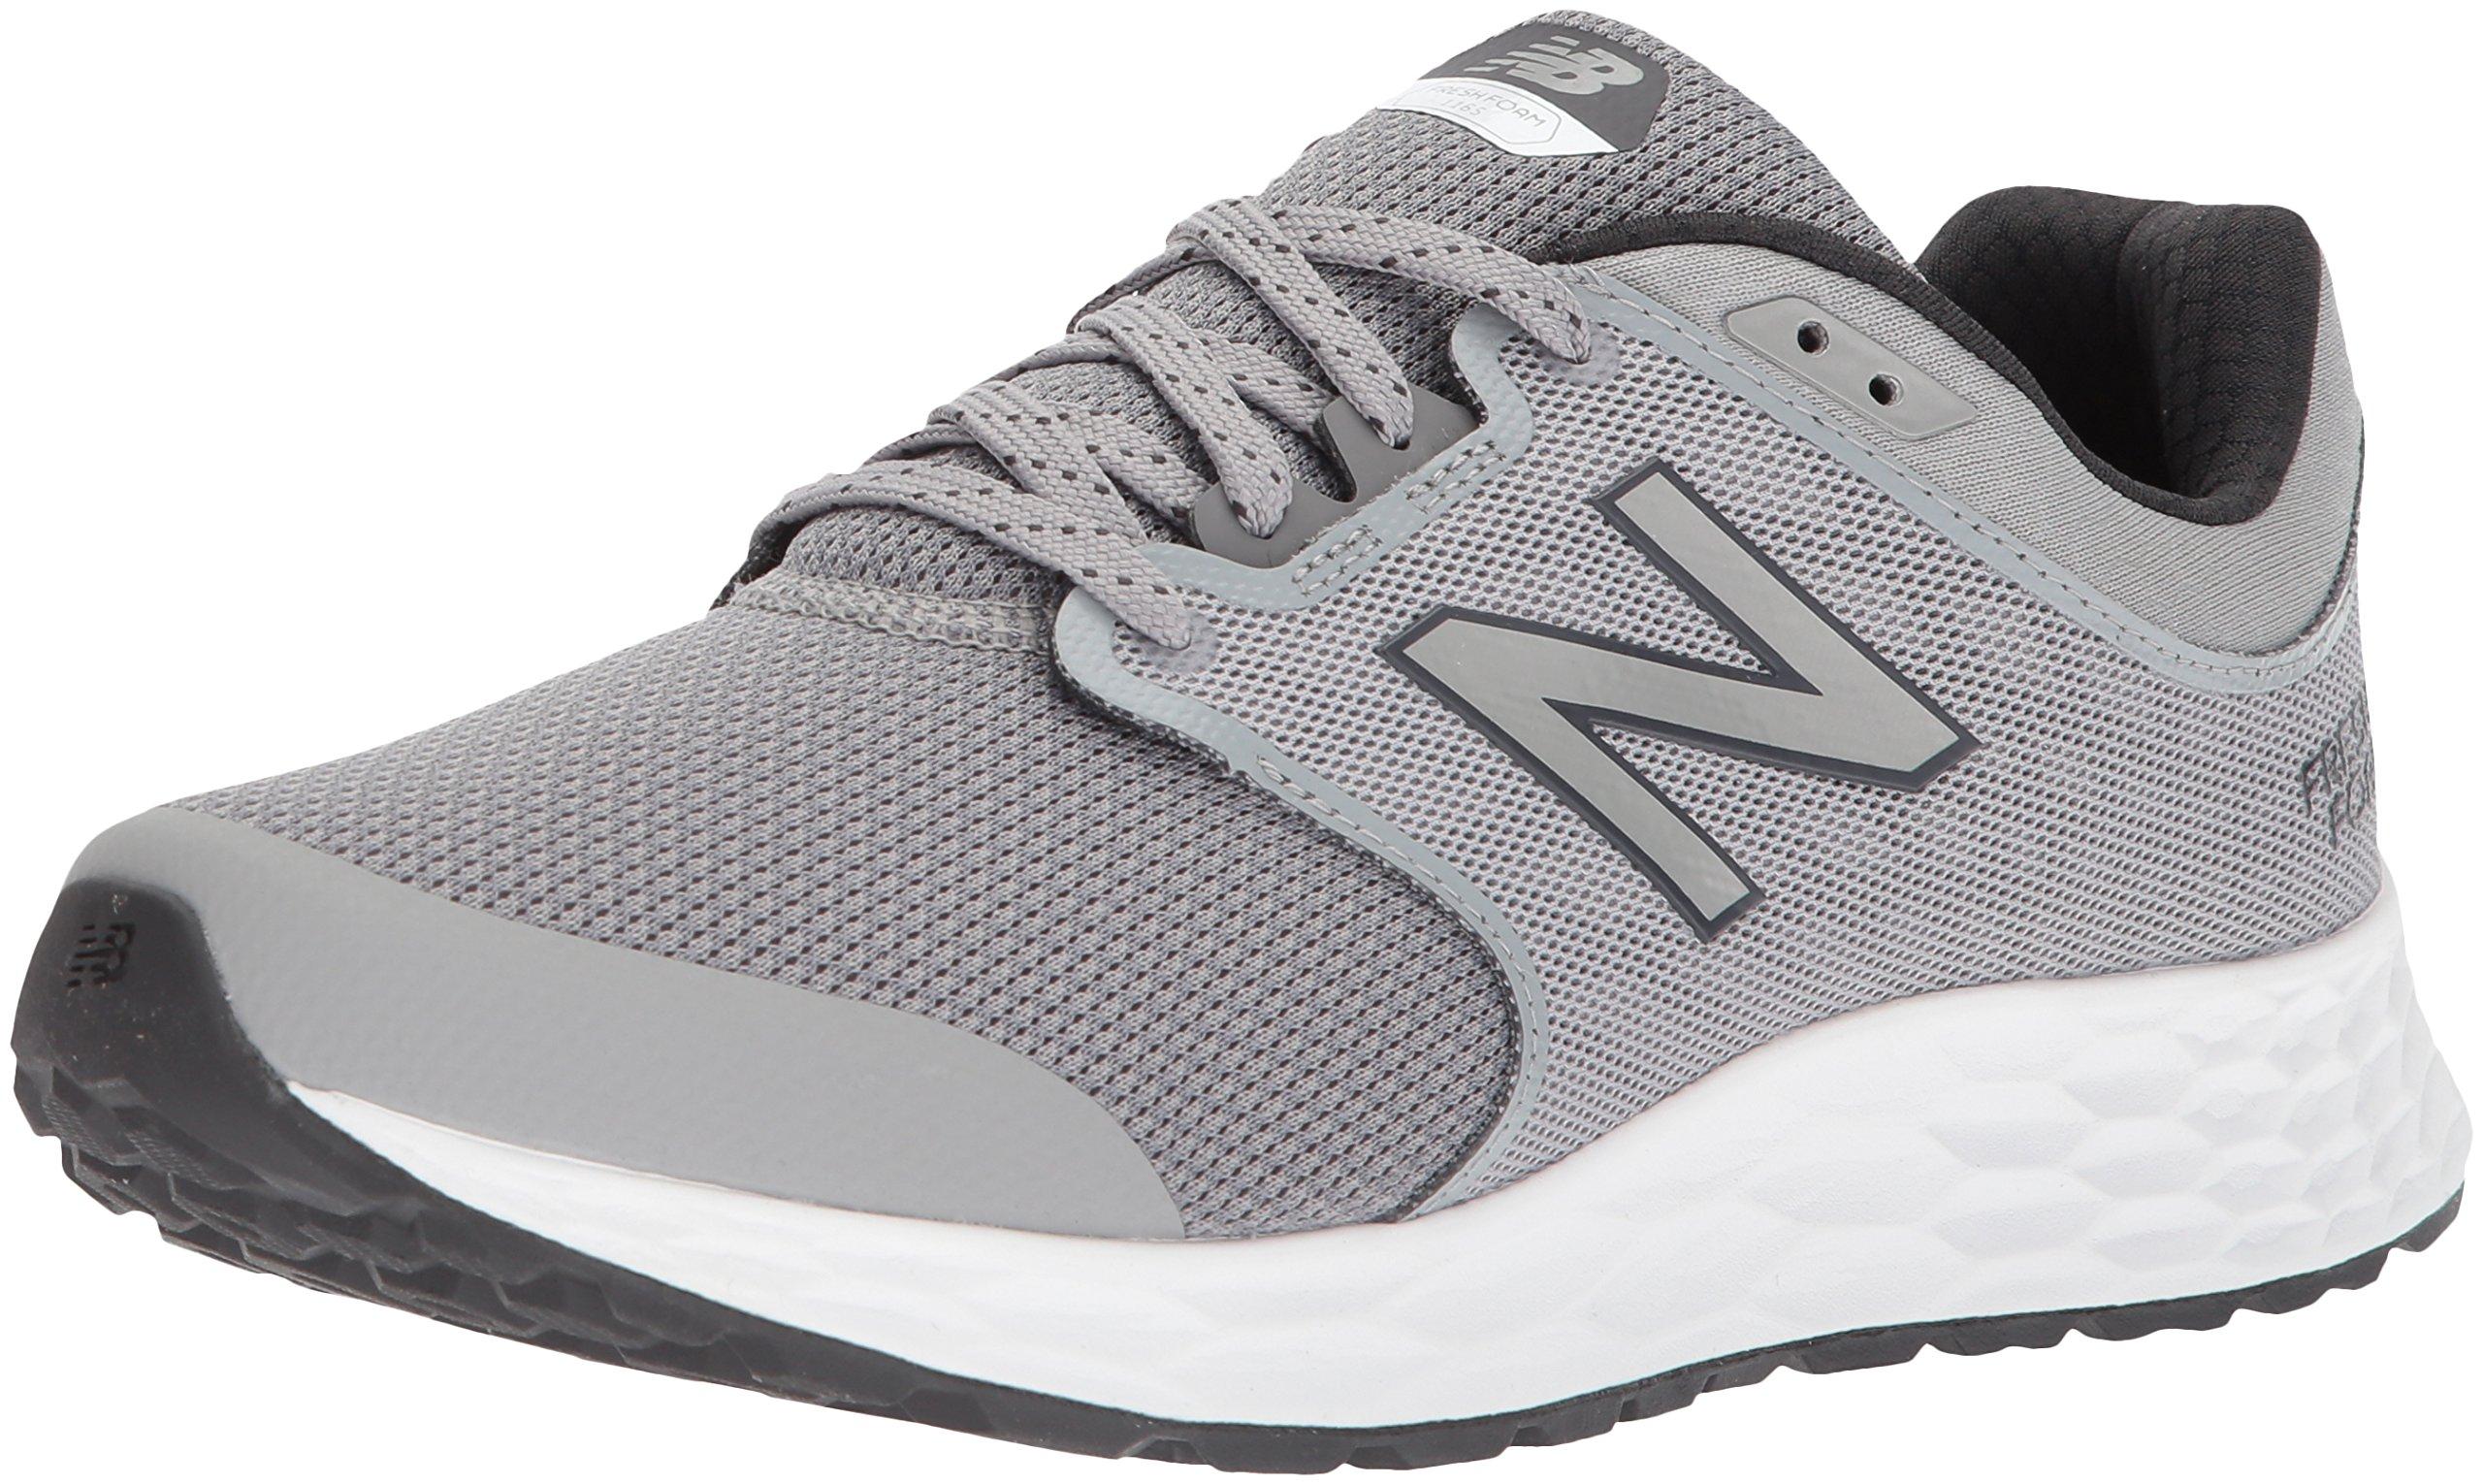 New Balance Men's 1165v1 Fresh Foam Walking Shoe, Grey/Black, 9.5 D US